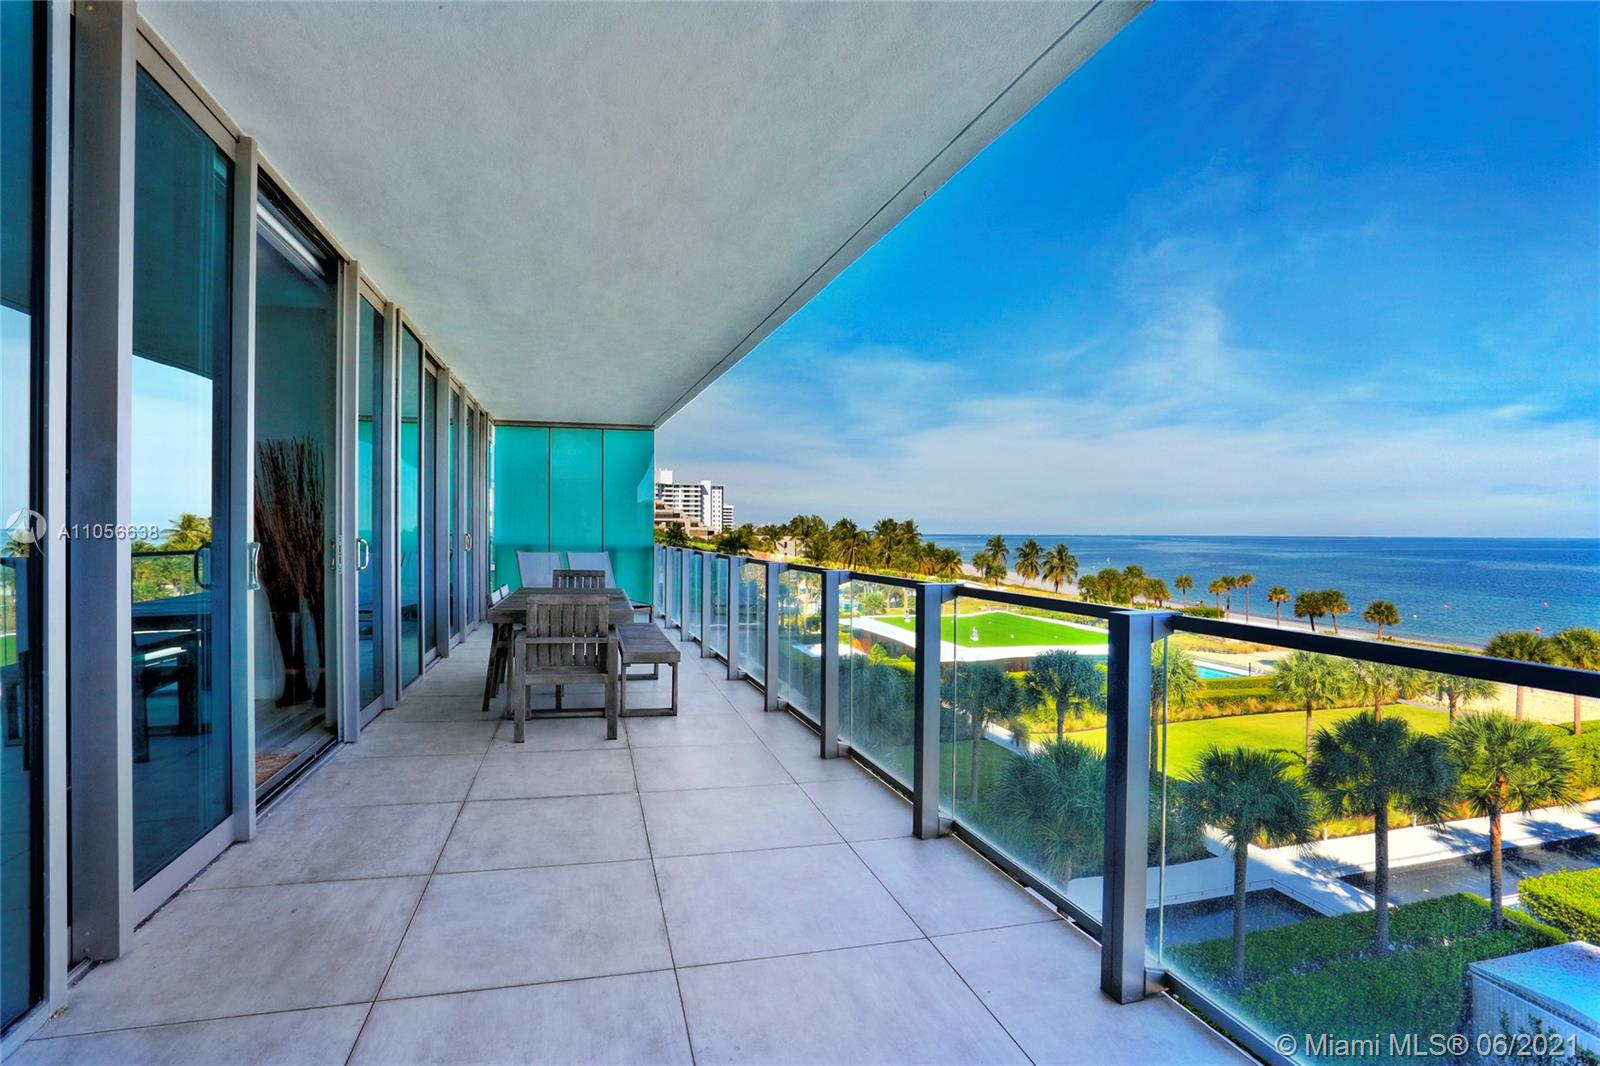 Oceana Key Biscayne #504S - 360 Ocean Drive #504S, Key Biscayne, FL 33149